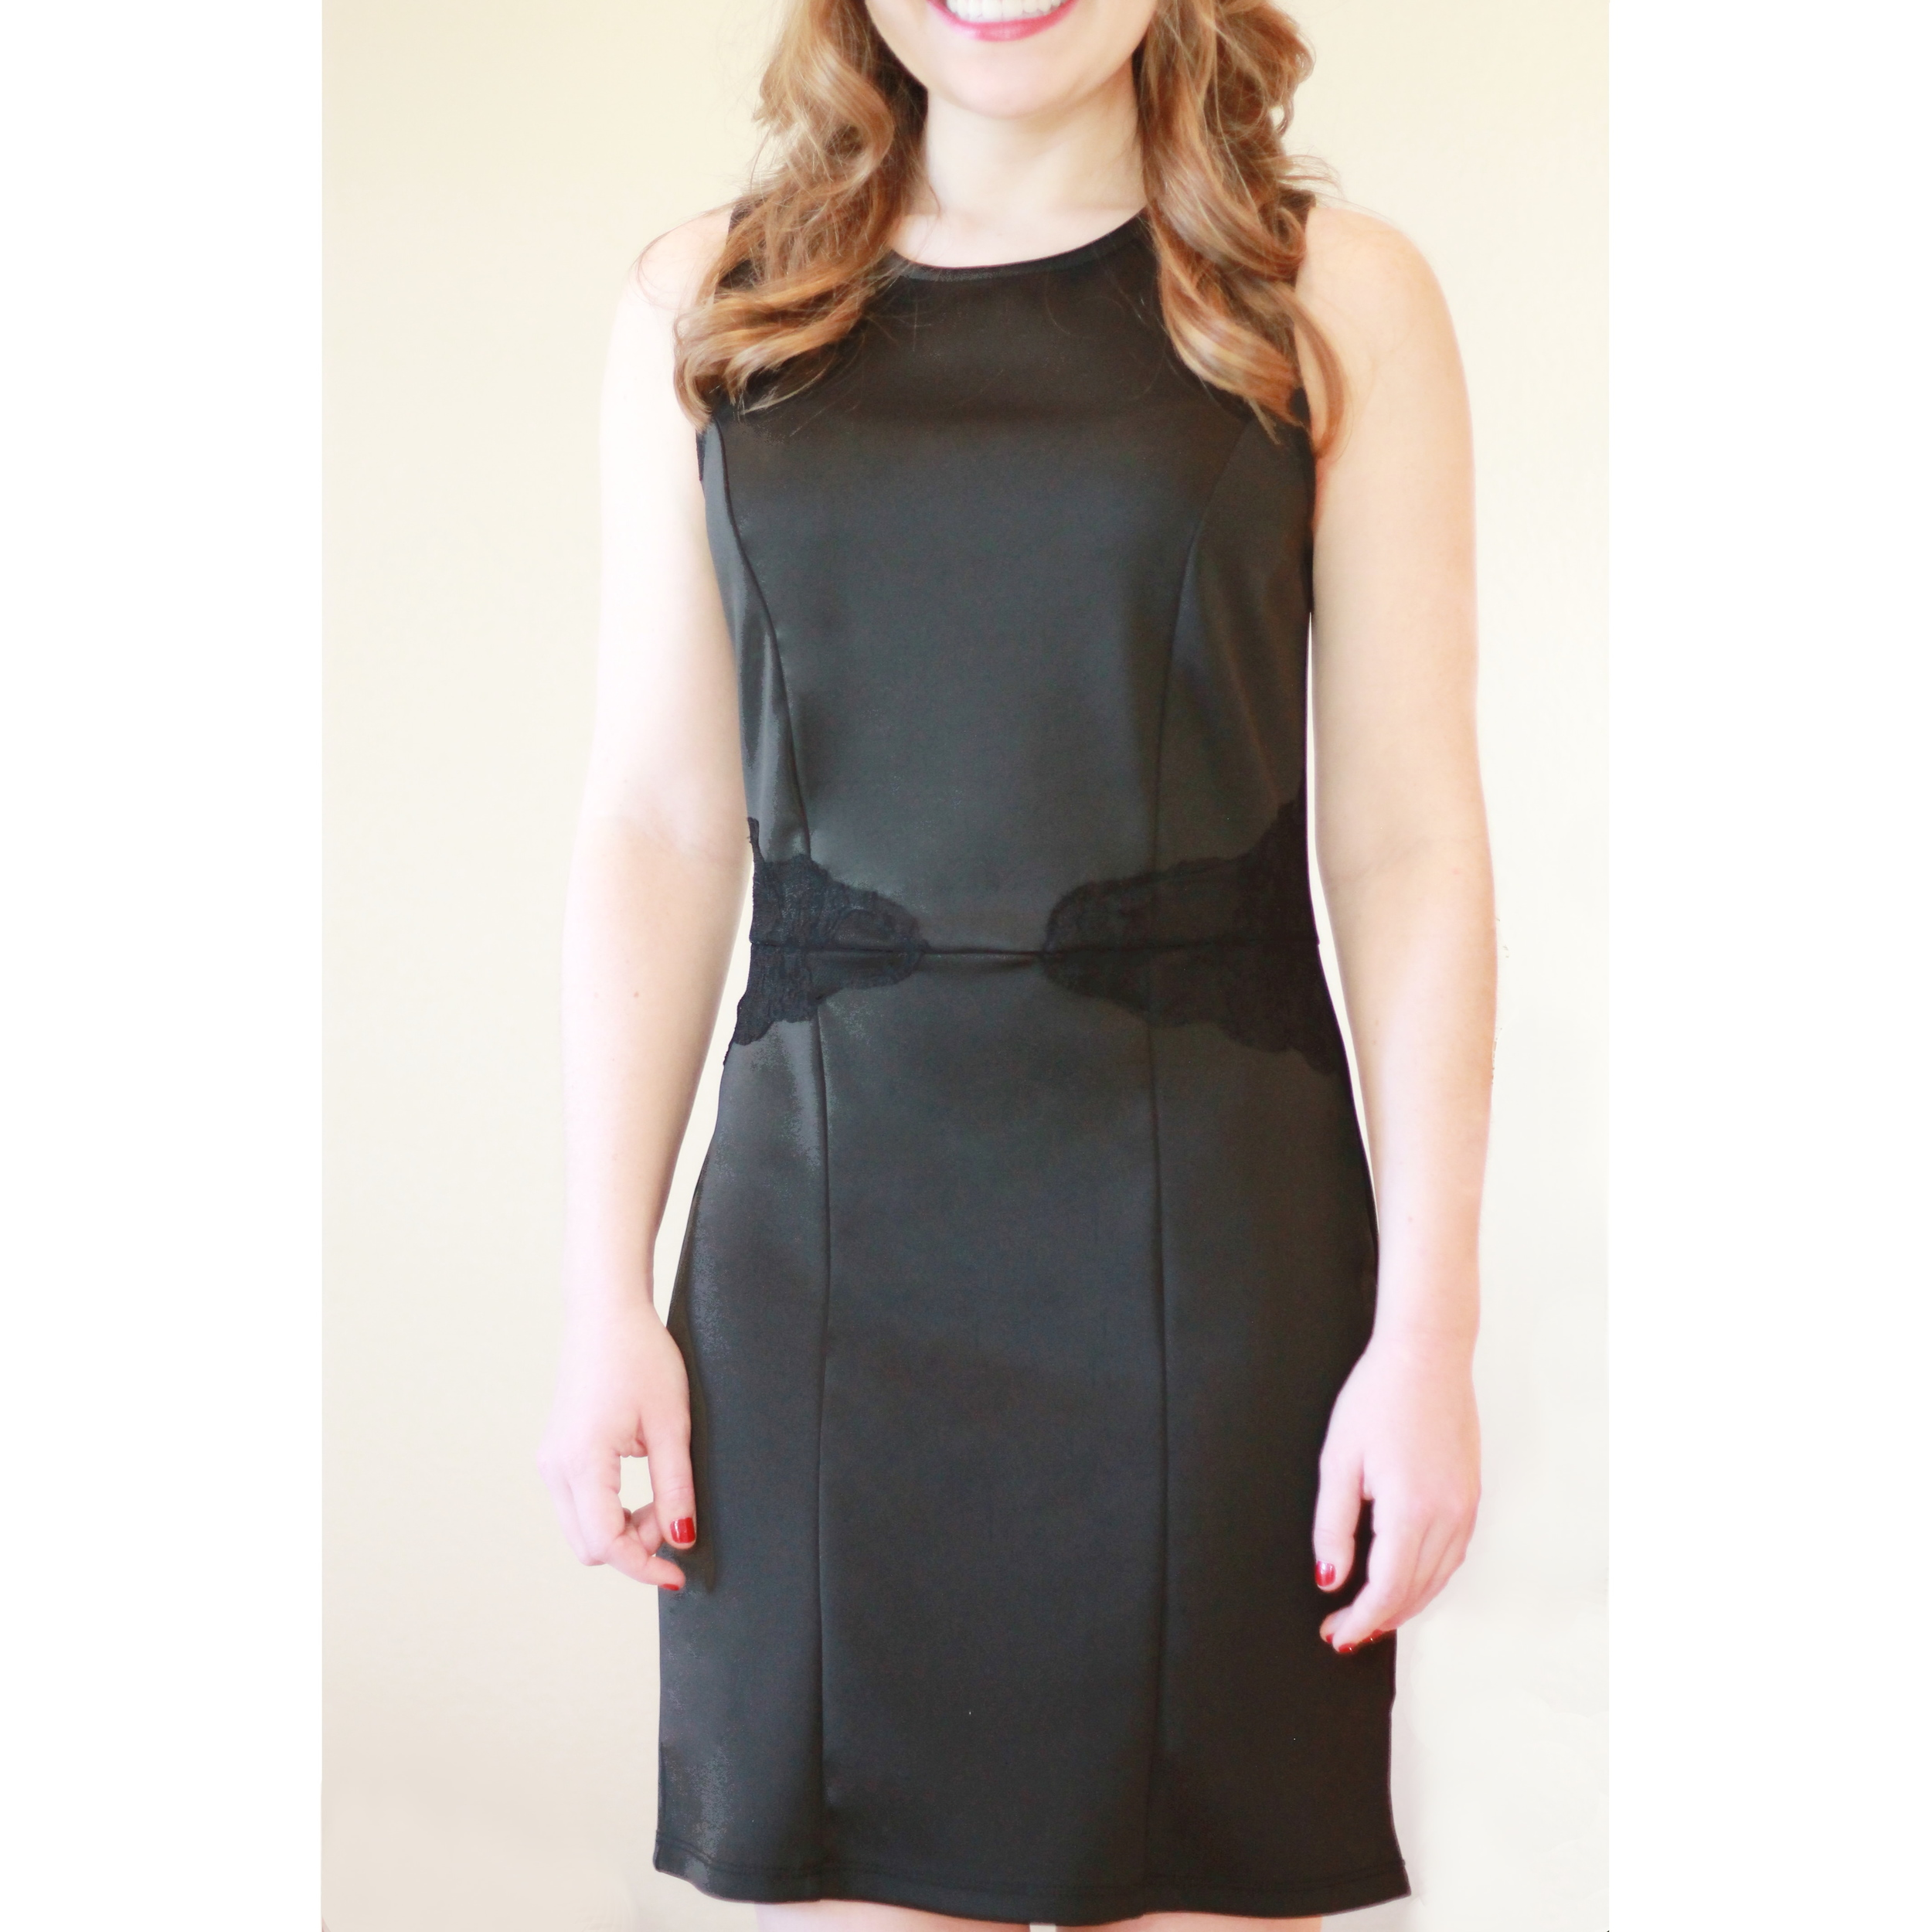 lace dress2.JPG